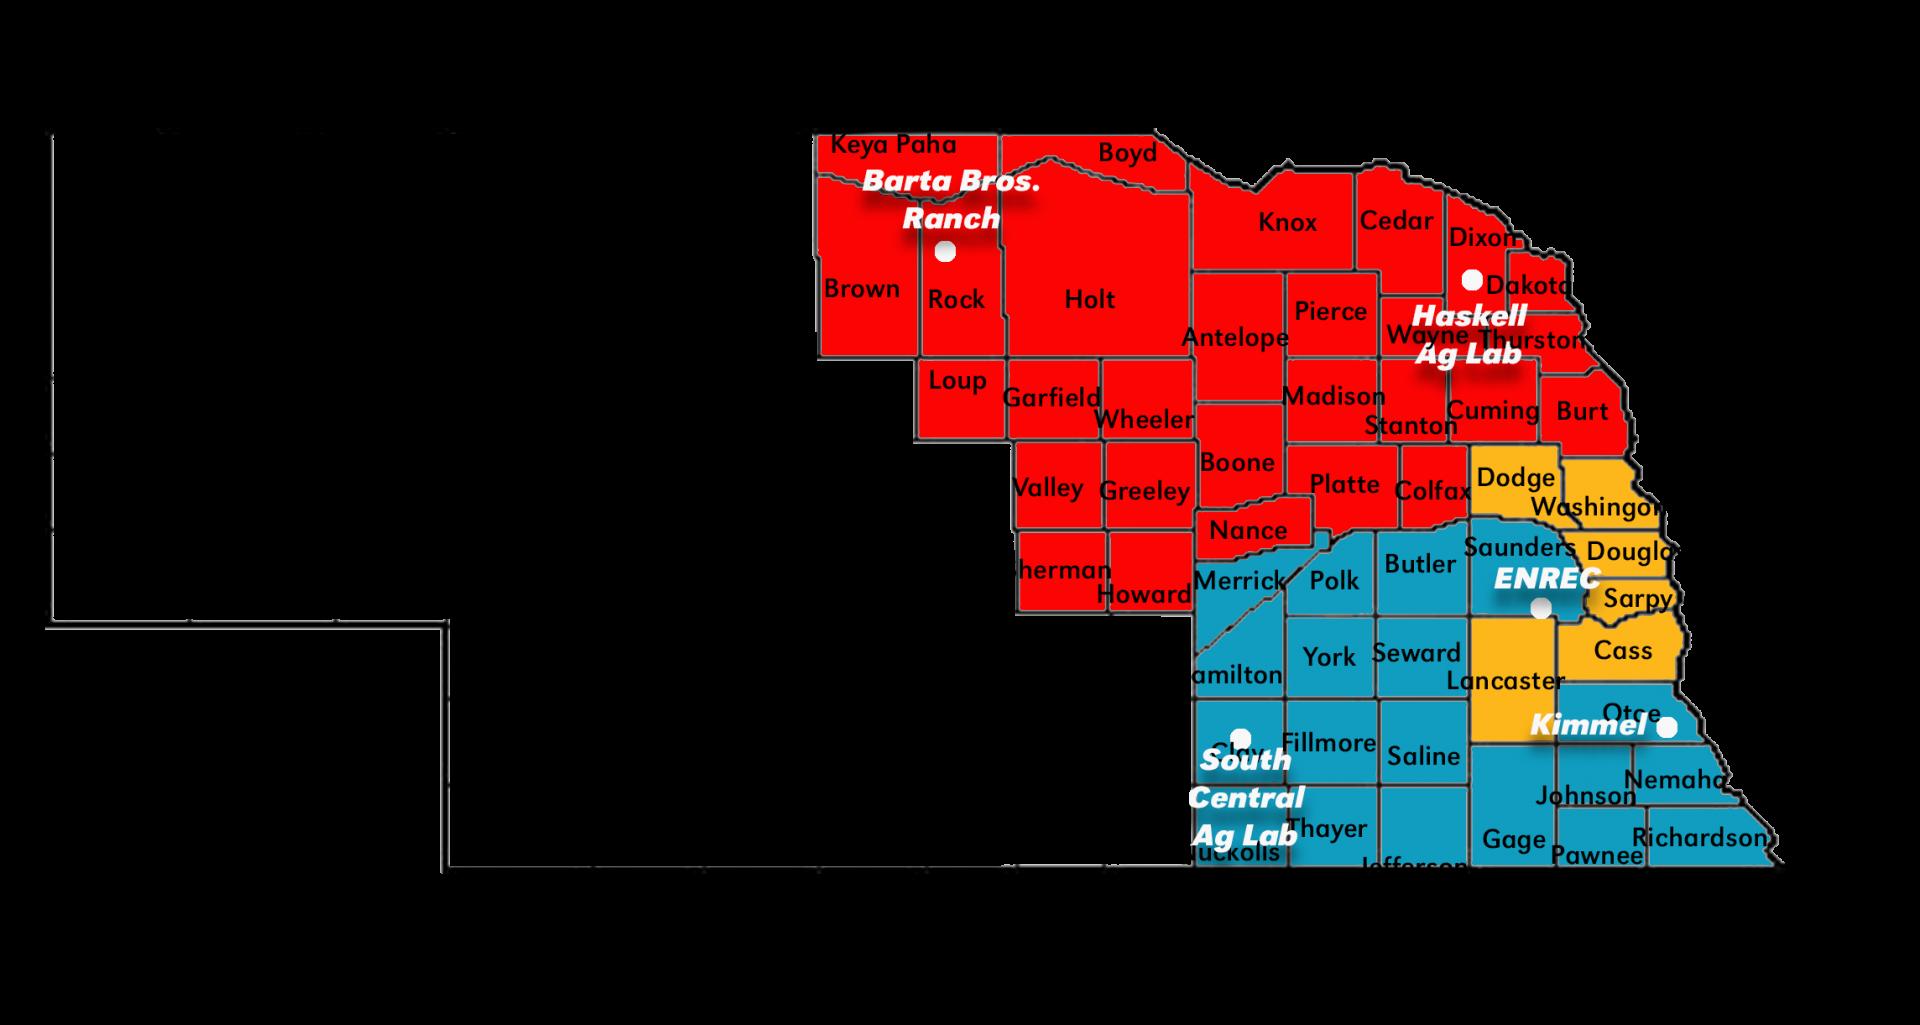 enre districts map nebraska extension